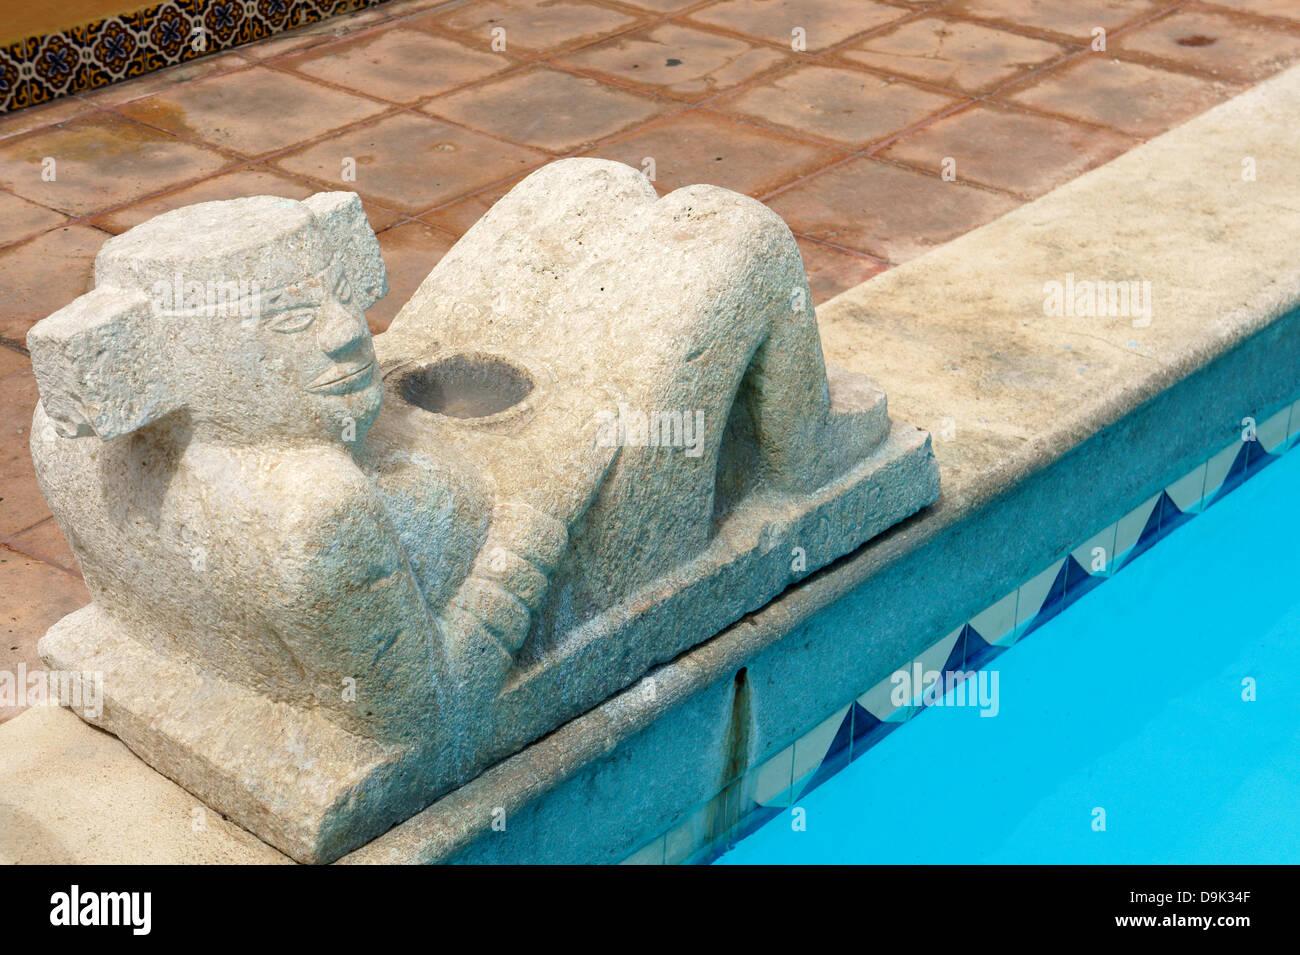 Mayan Chacmool sculpture and rooftop swimming pool at the Hotel Caribe, Merida, Yucatan, Mexico - Stock Image